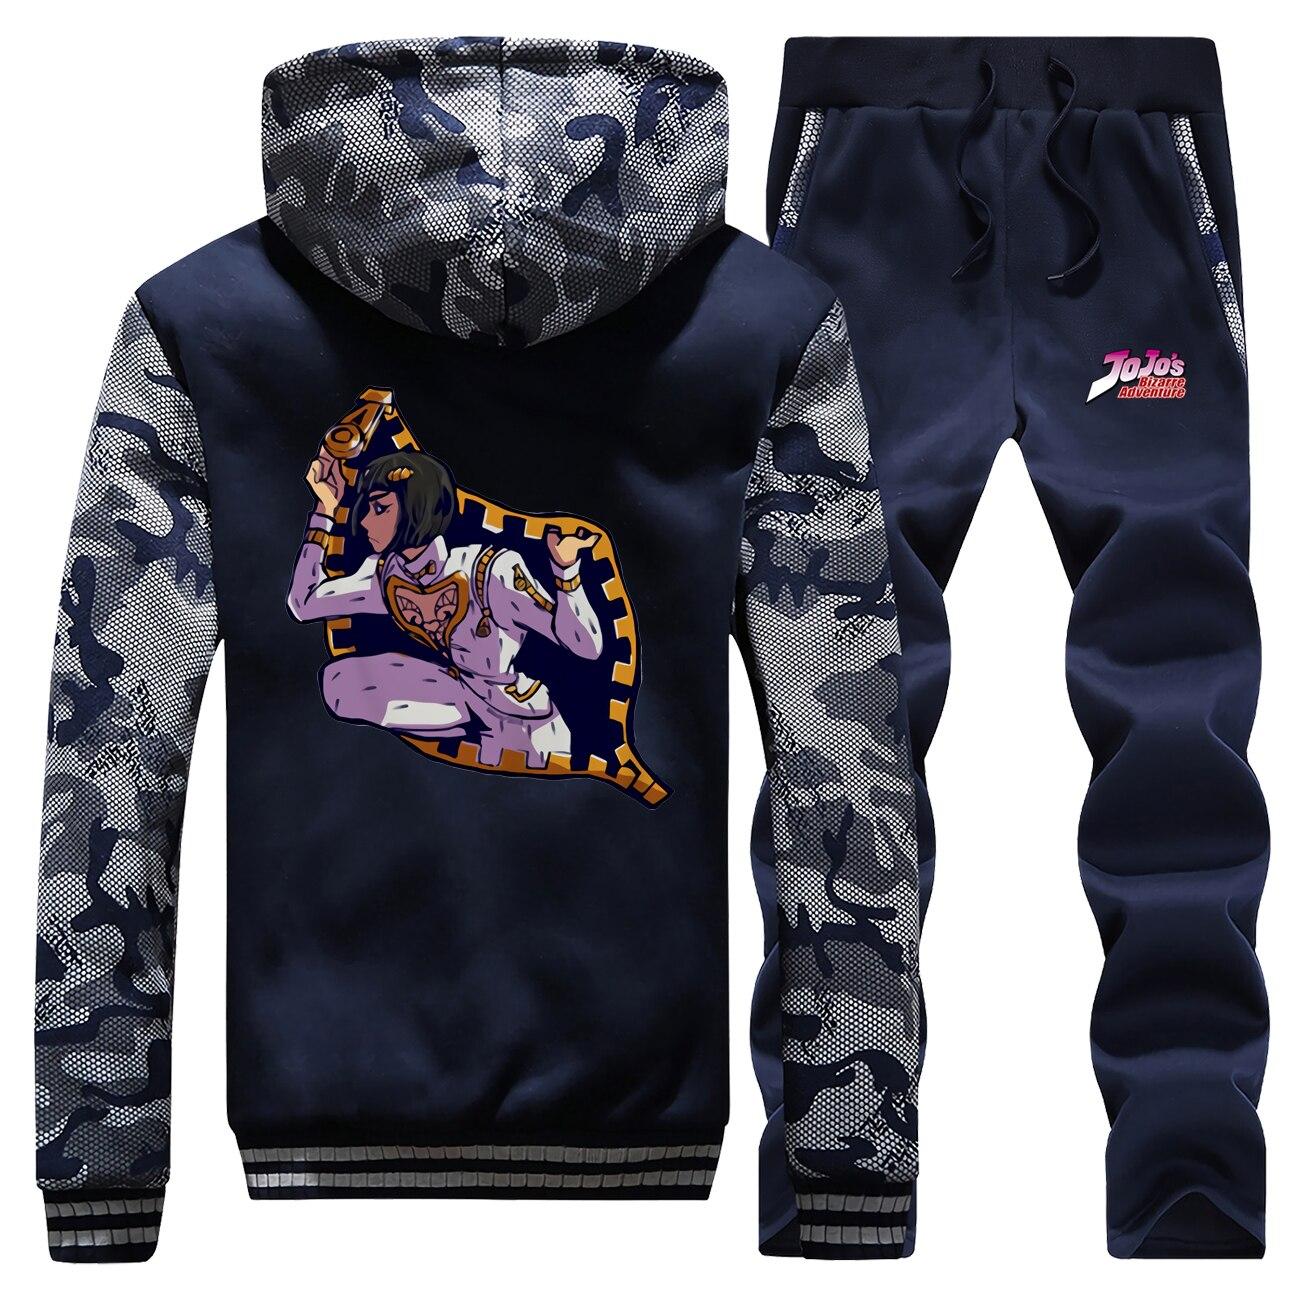 Anime Harajuku Hoodies Suit Winter Fleece Men Sweatshirt JoJo Bizarre Adventure Graphic Tracksuit Mens Jacket+Pants 2 Piece Sets